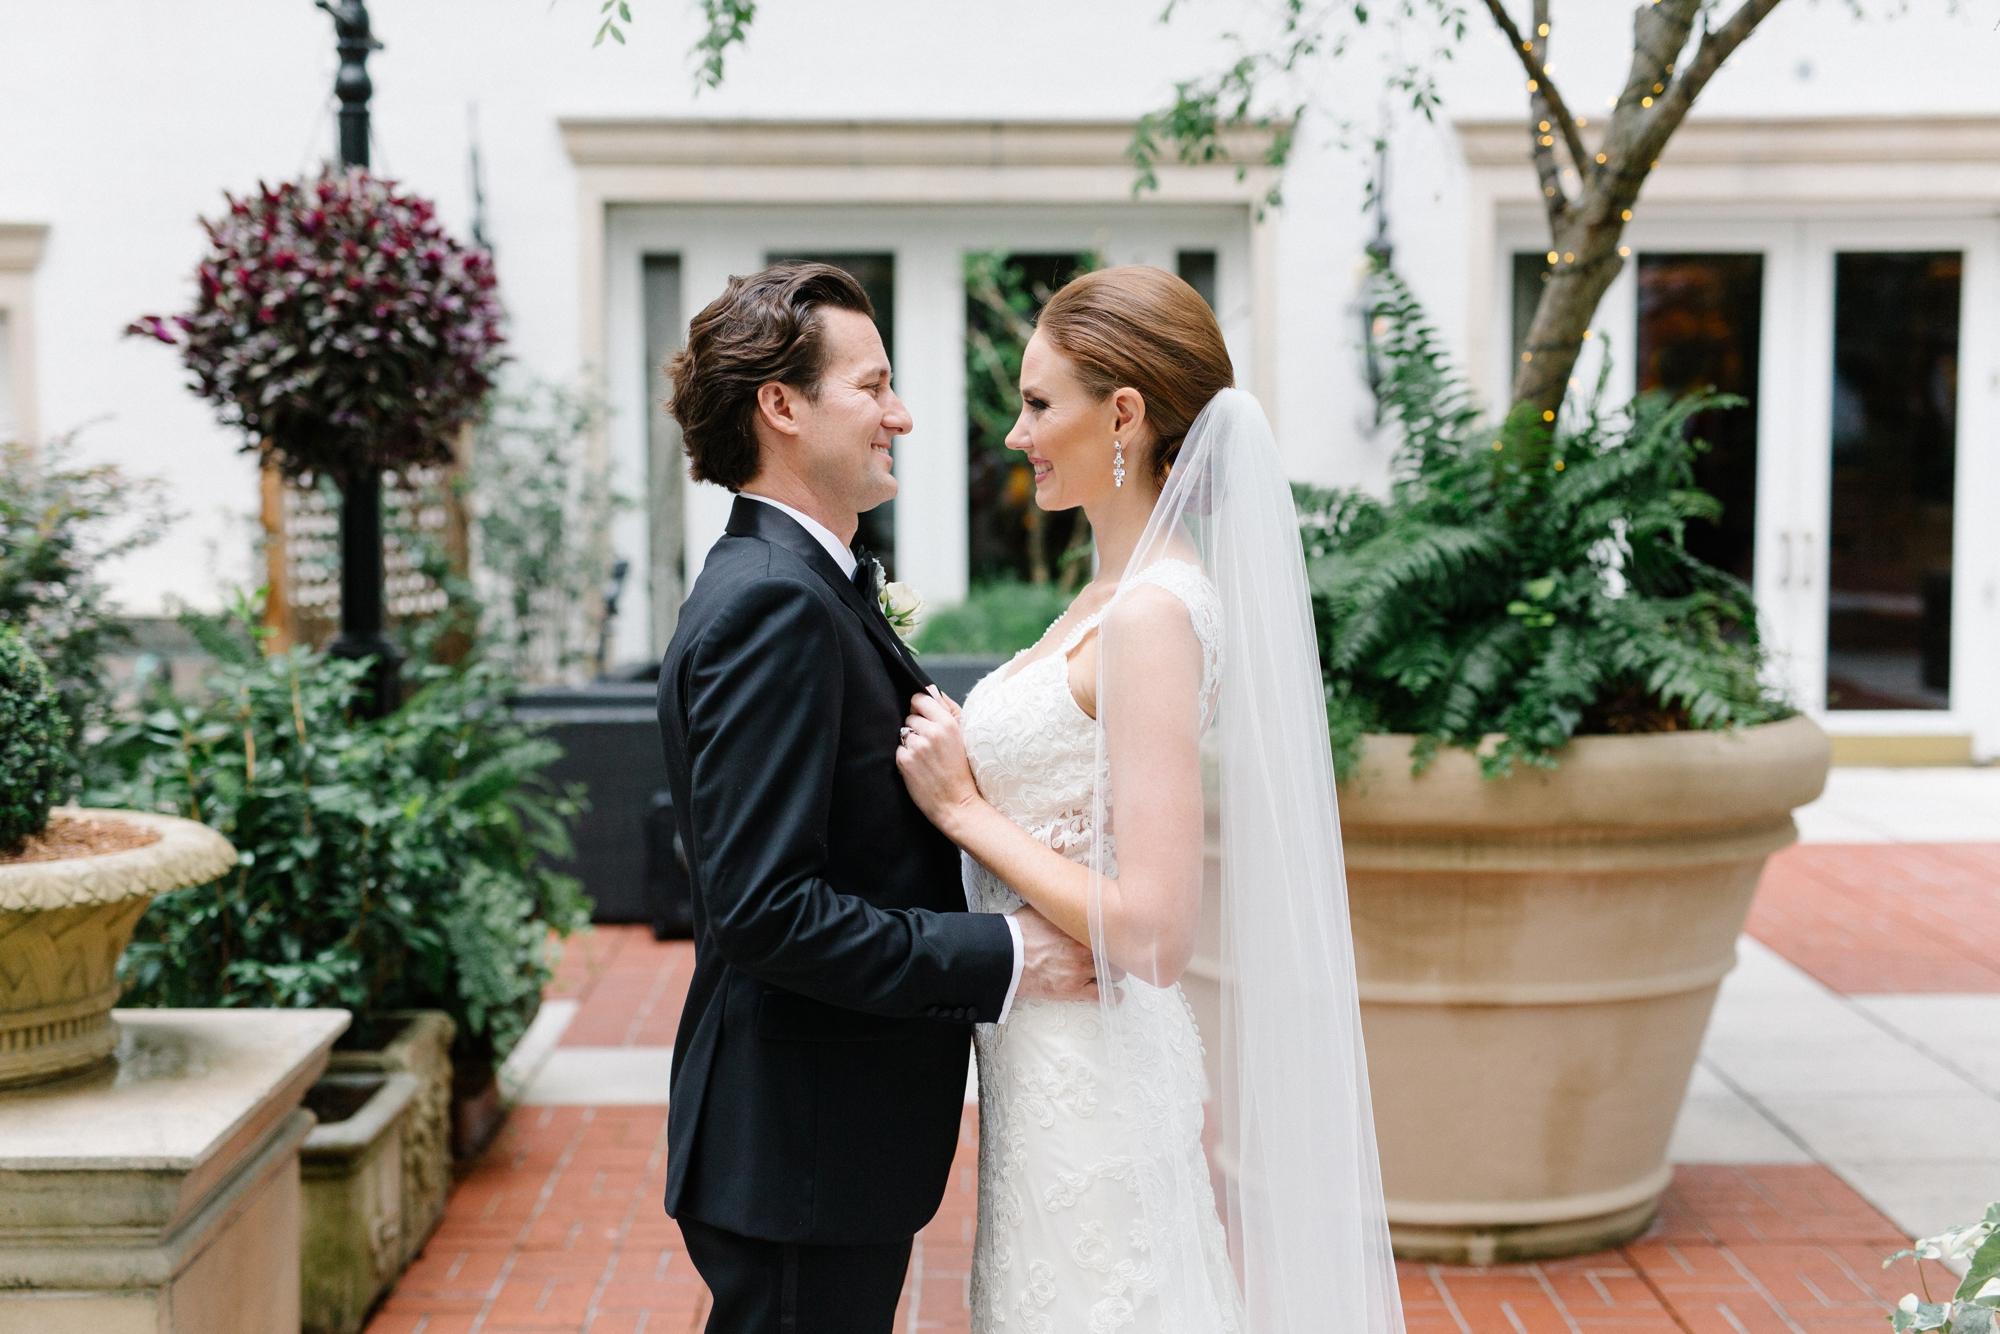 New_Orleans_Wedding_Photographer_1200.jpg